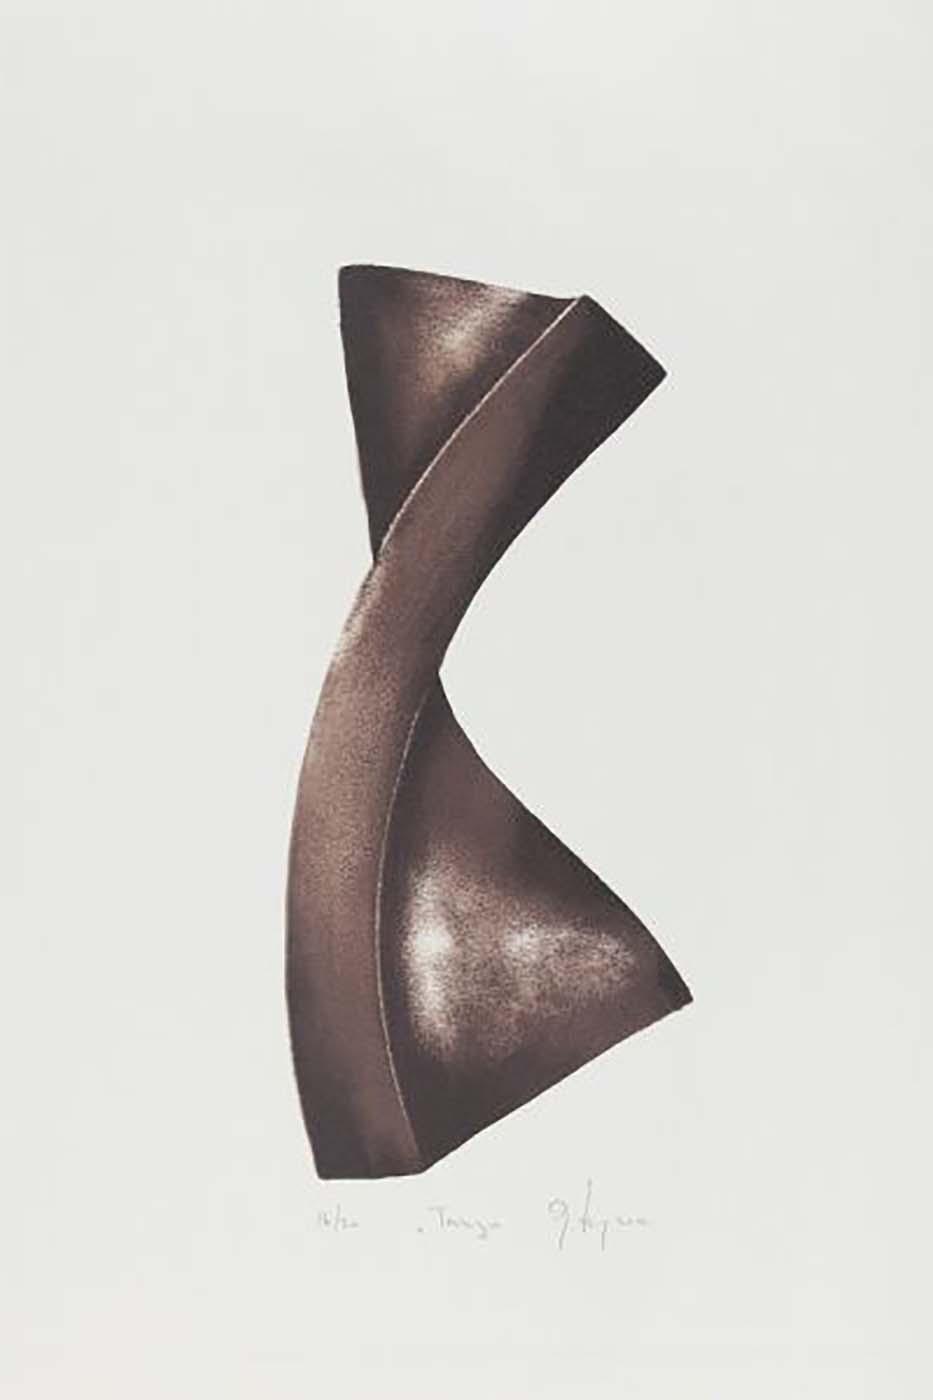 TANGO, 2012, 27 x 34 cm (k)